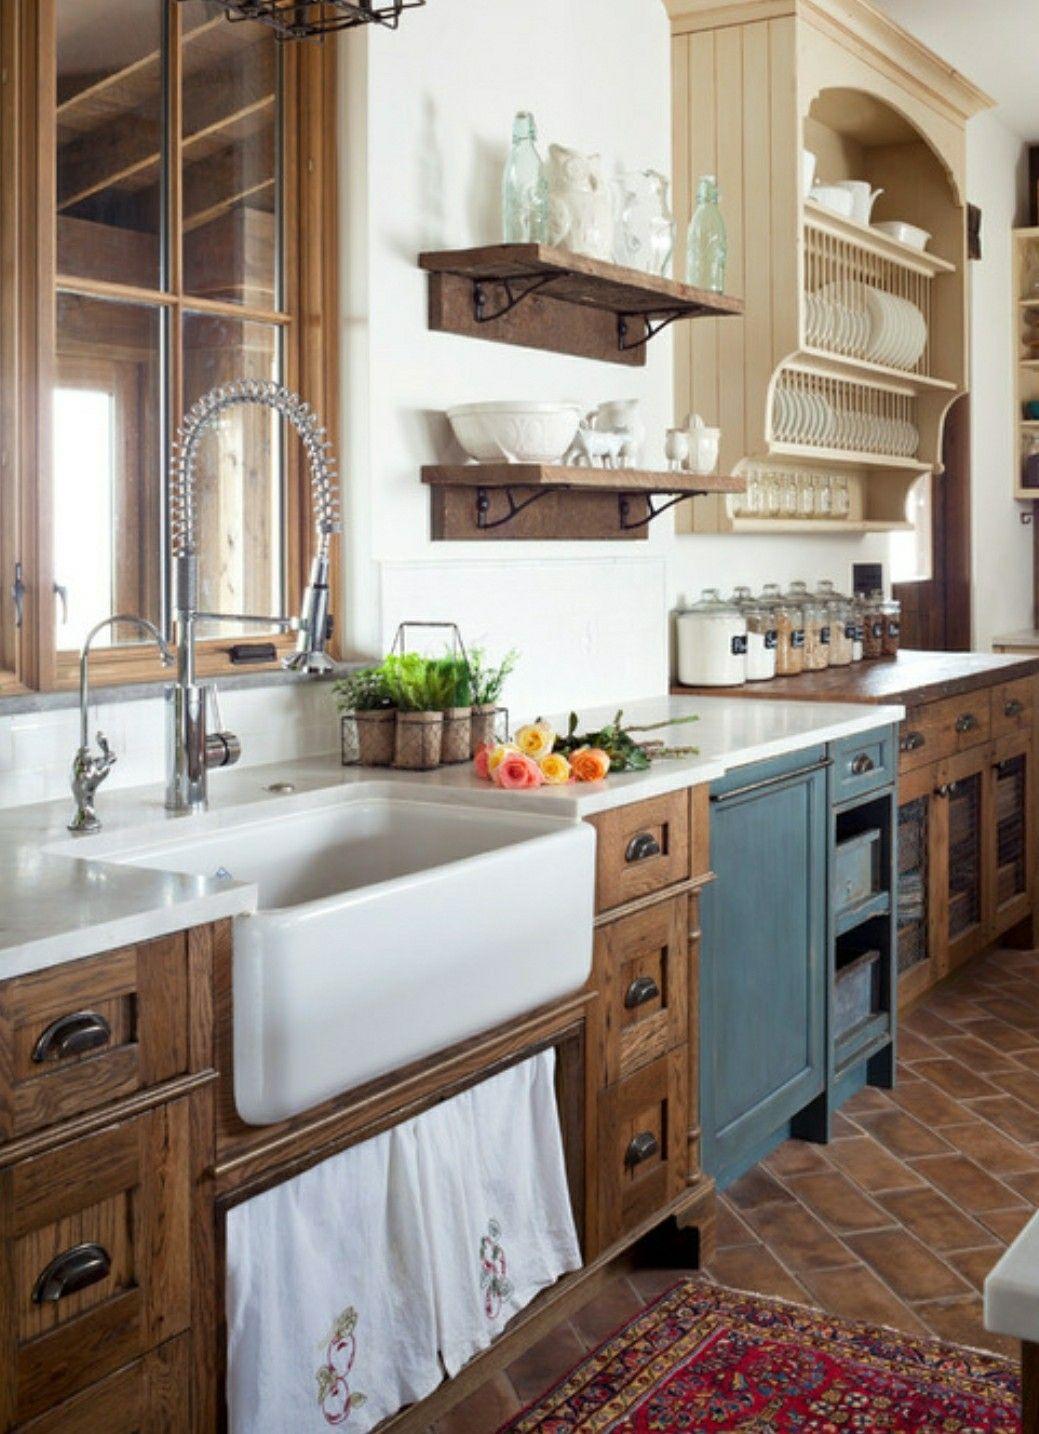 Farmhouse Kitchen Love The Cabinets Cuisines Rustiques